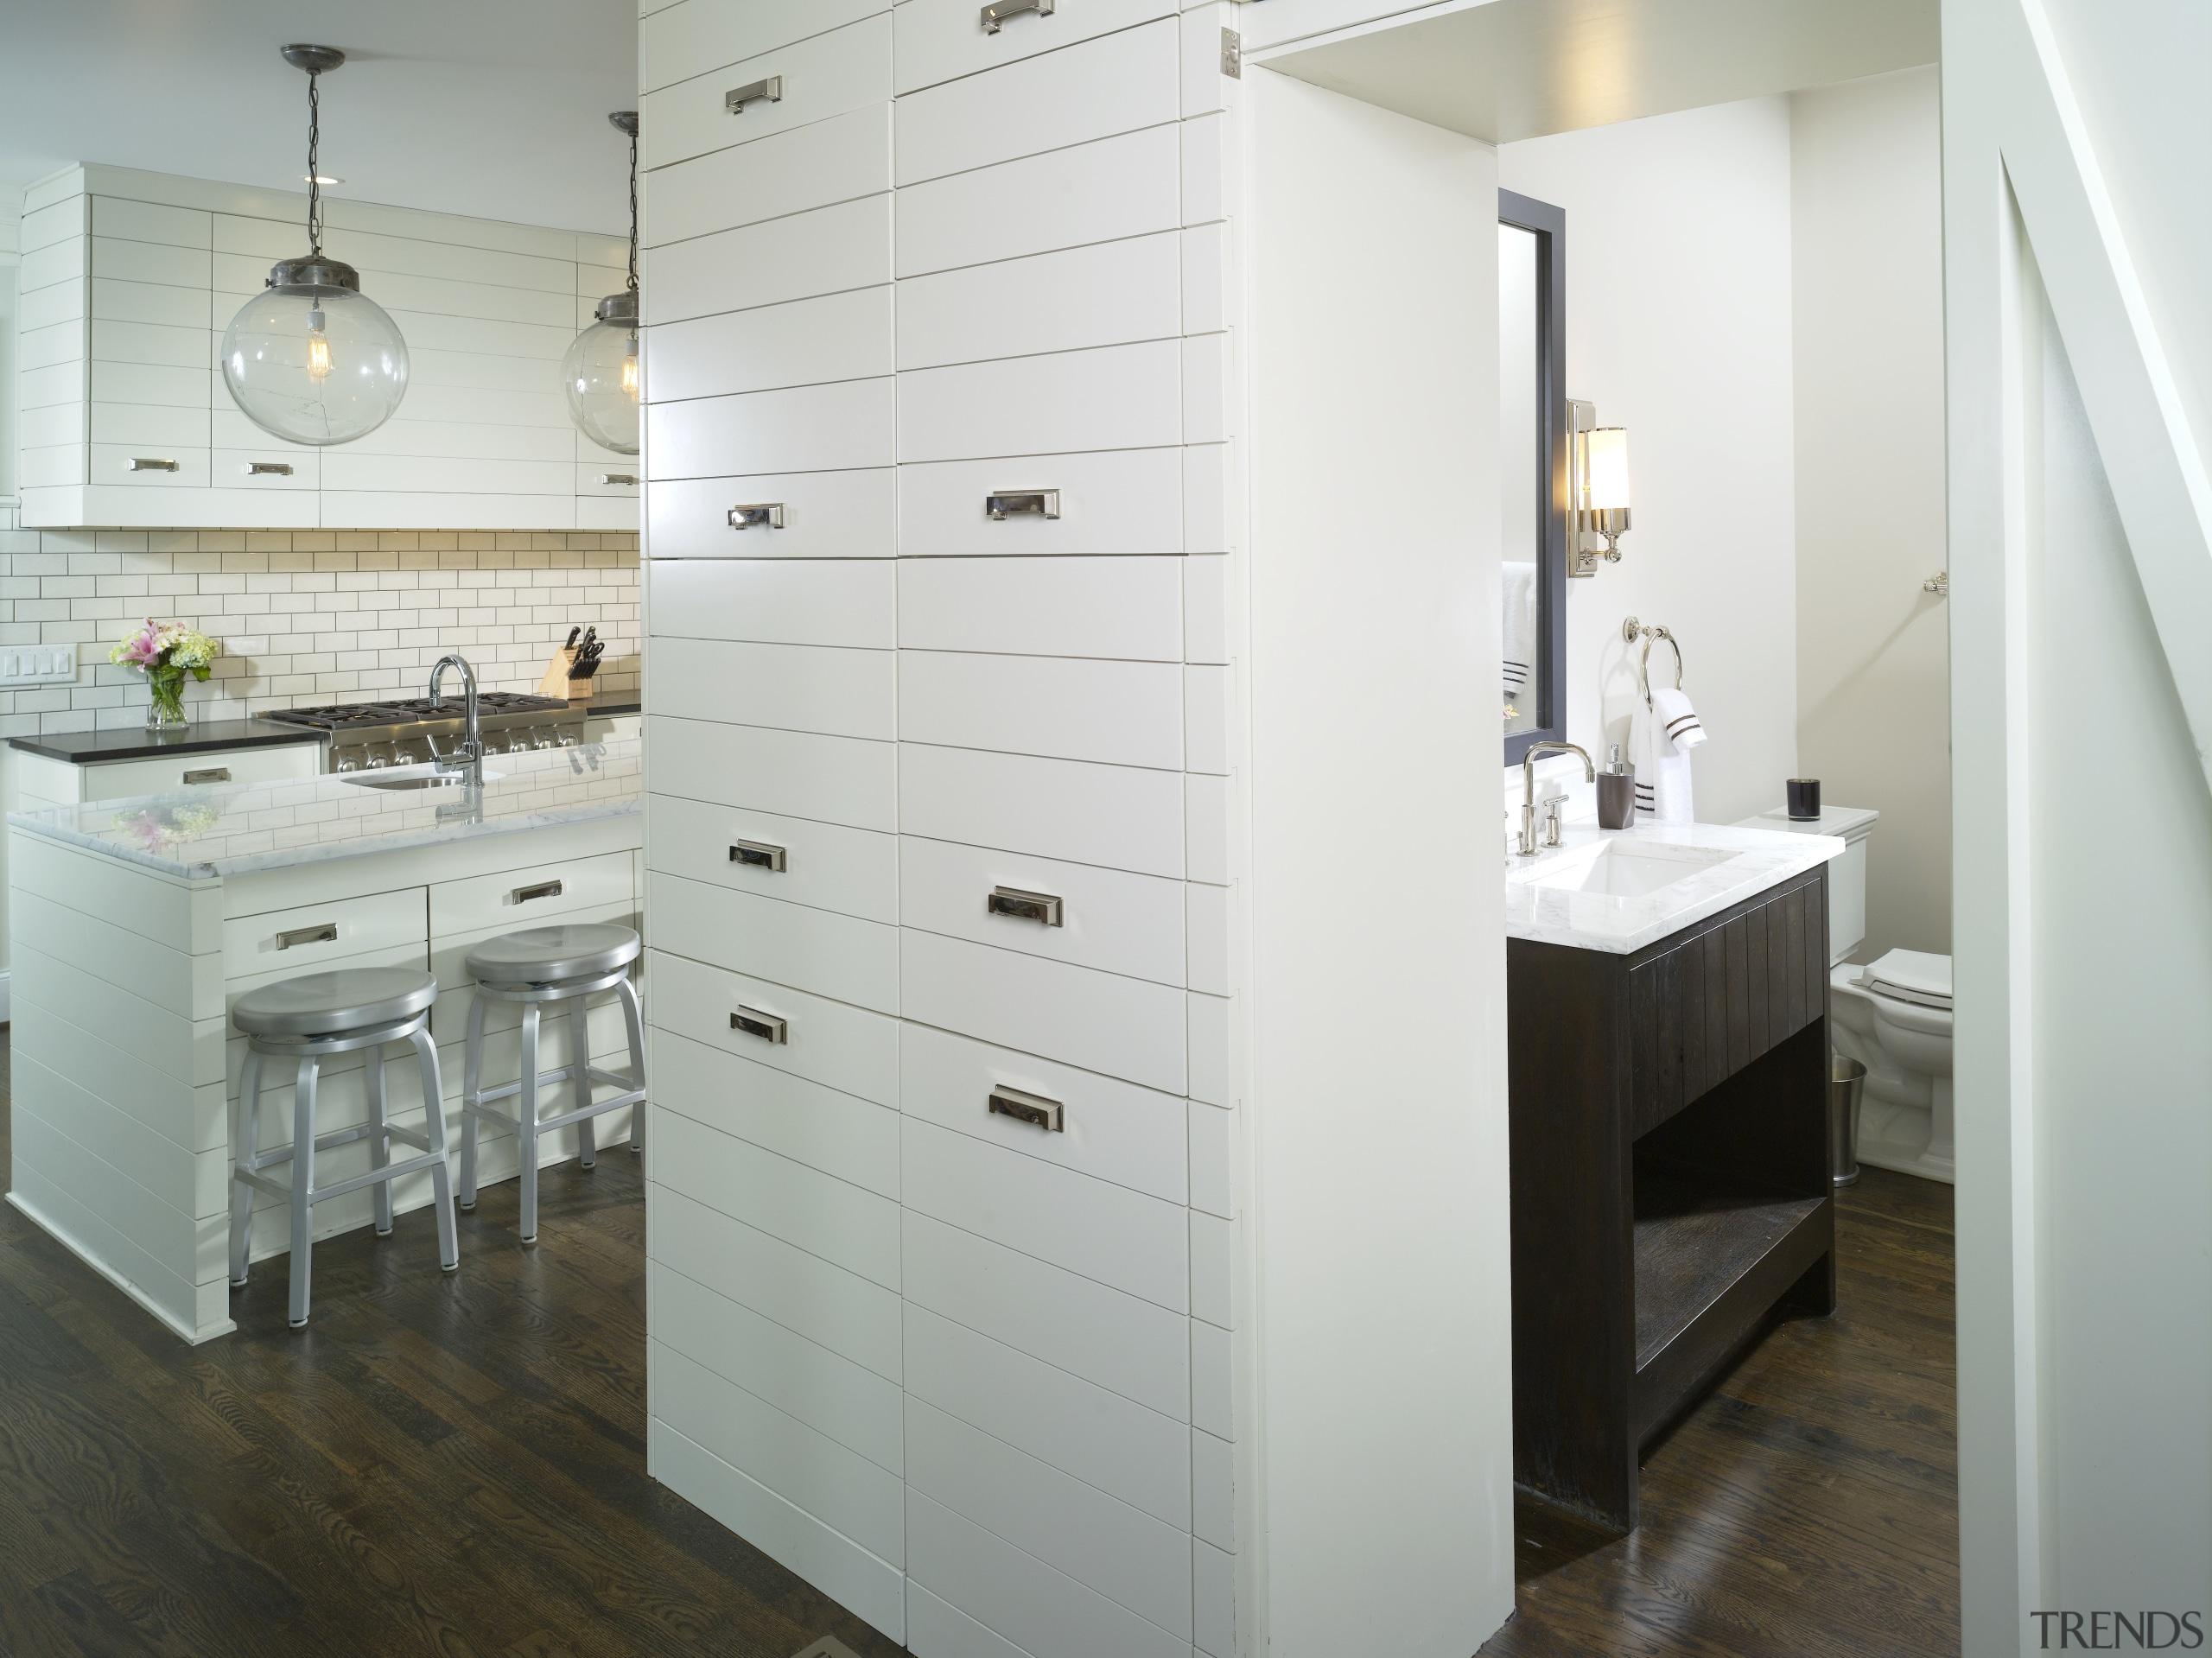 View of kitchen by Designer Willis Watts. Remodelled bathroom, bathroom accessory, bathroom cabinet, cabinetry, countertop, floor, flooring, home, interior design, kitchen, room, sink, gray, white